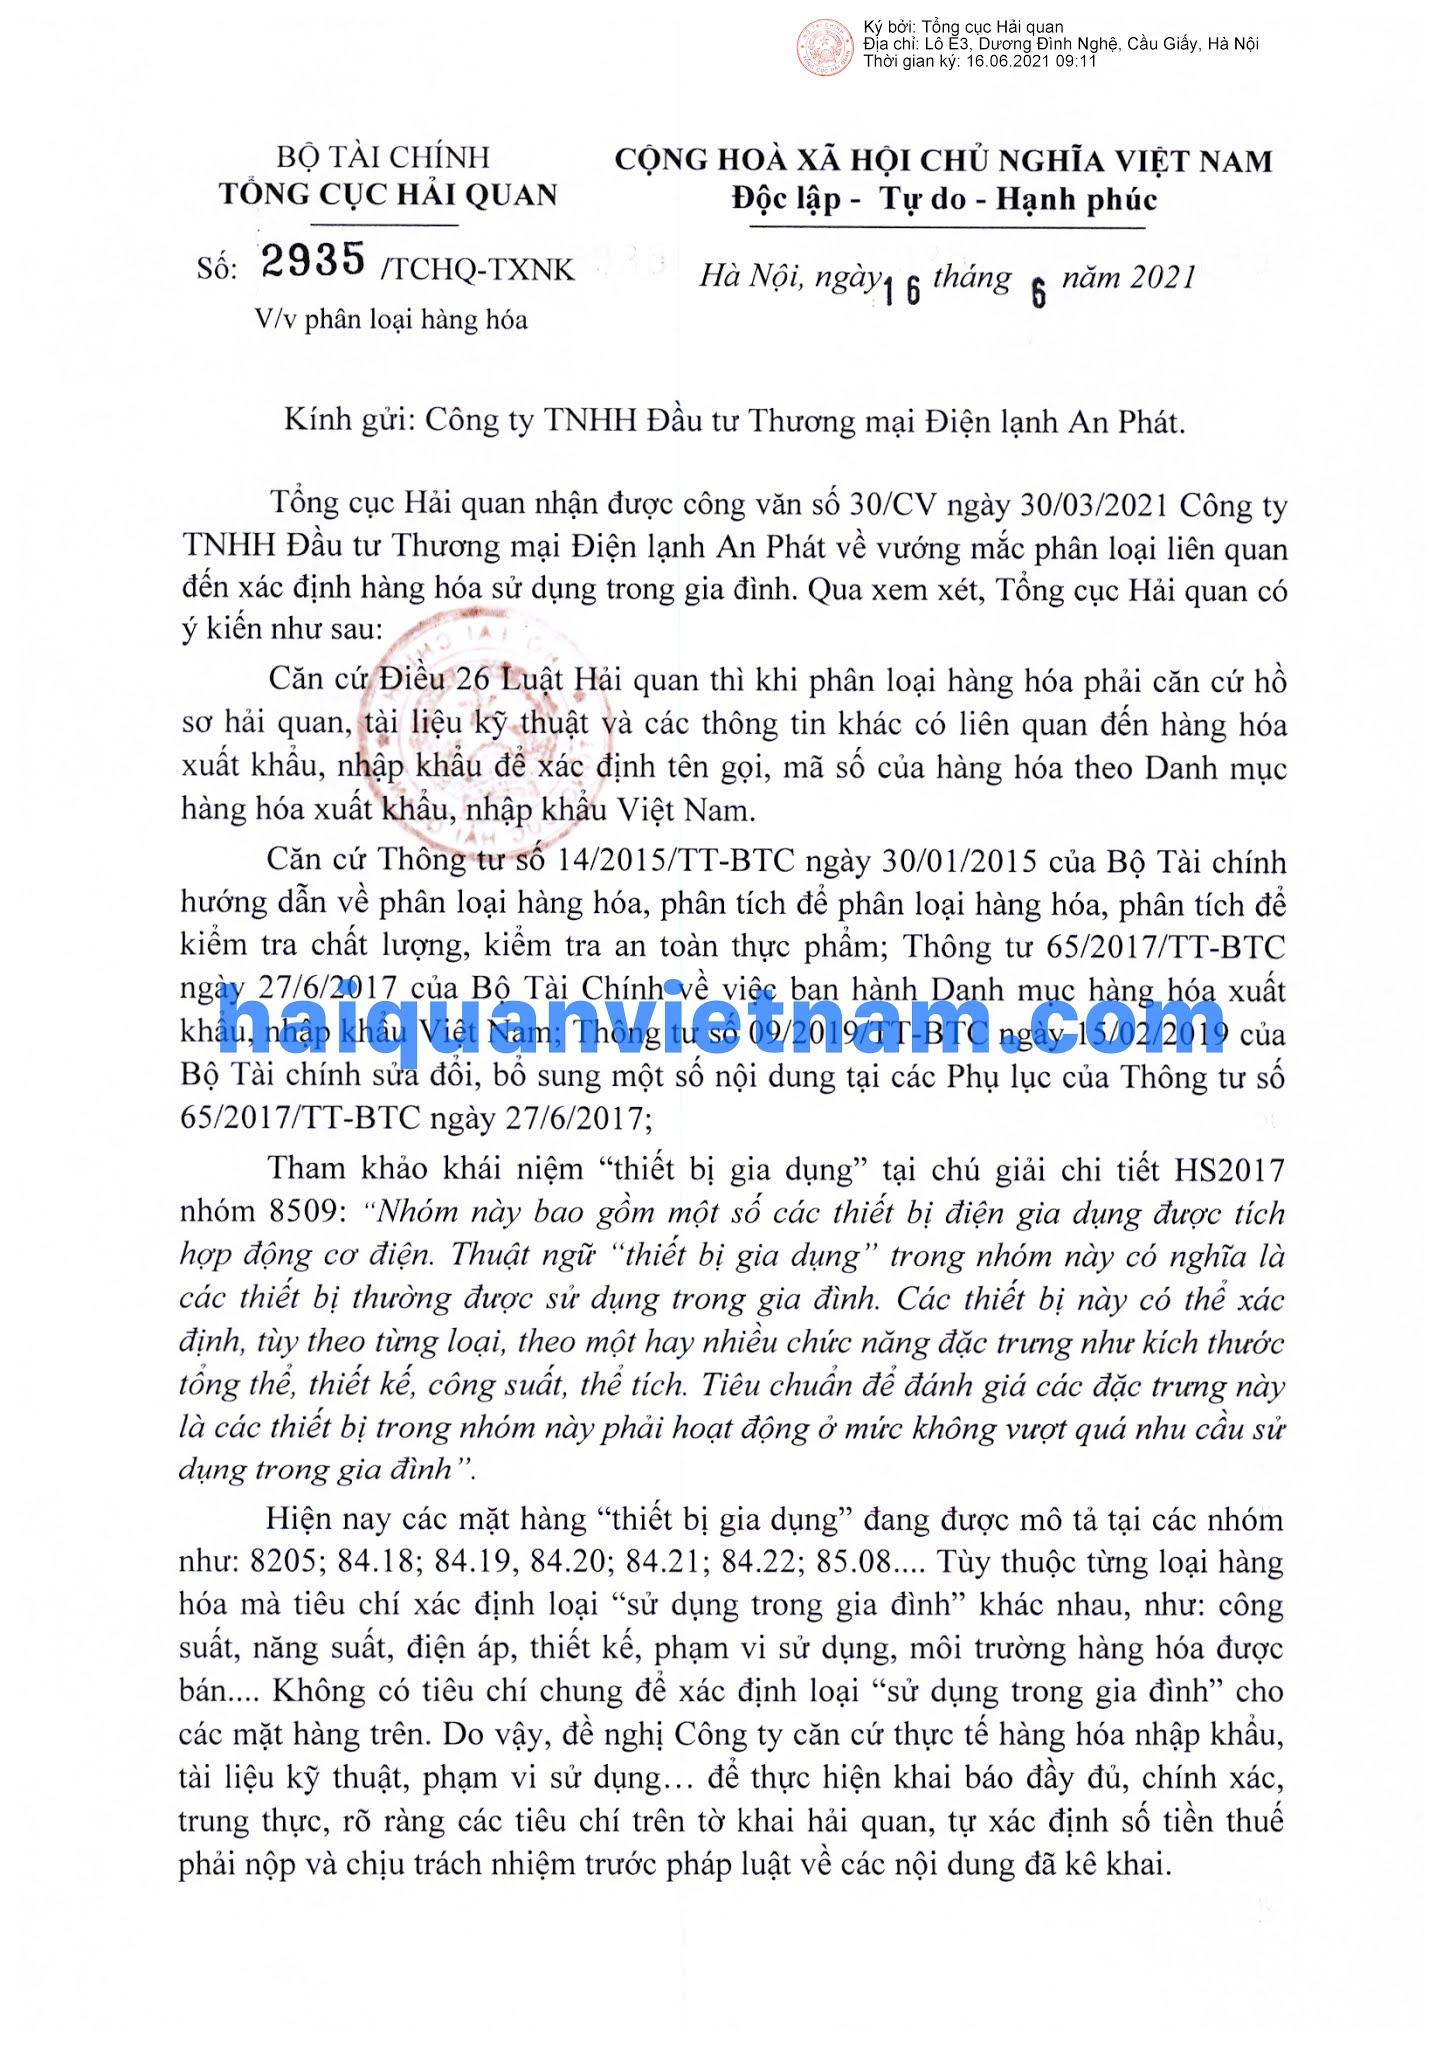 [Image: 210616_2935_TCHQ-TXNK_haiquanvietnam_01.jpg]